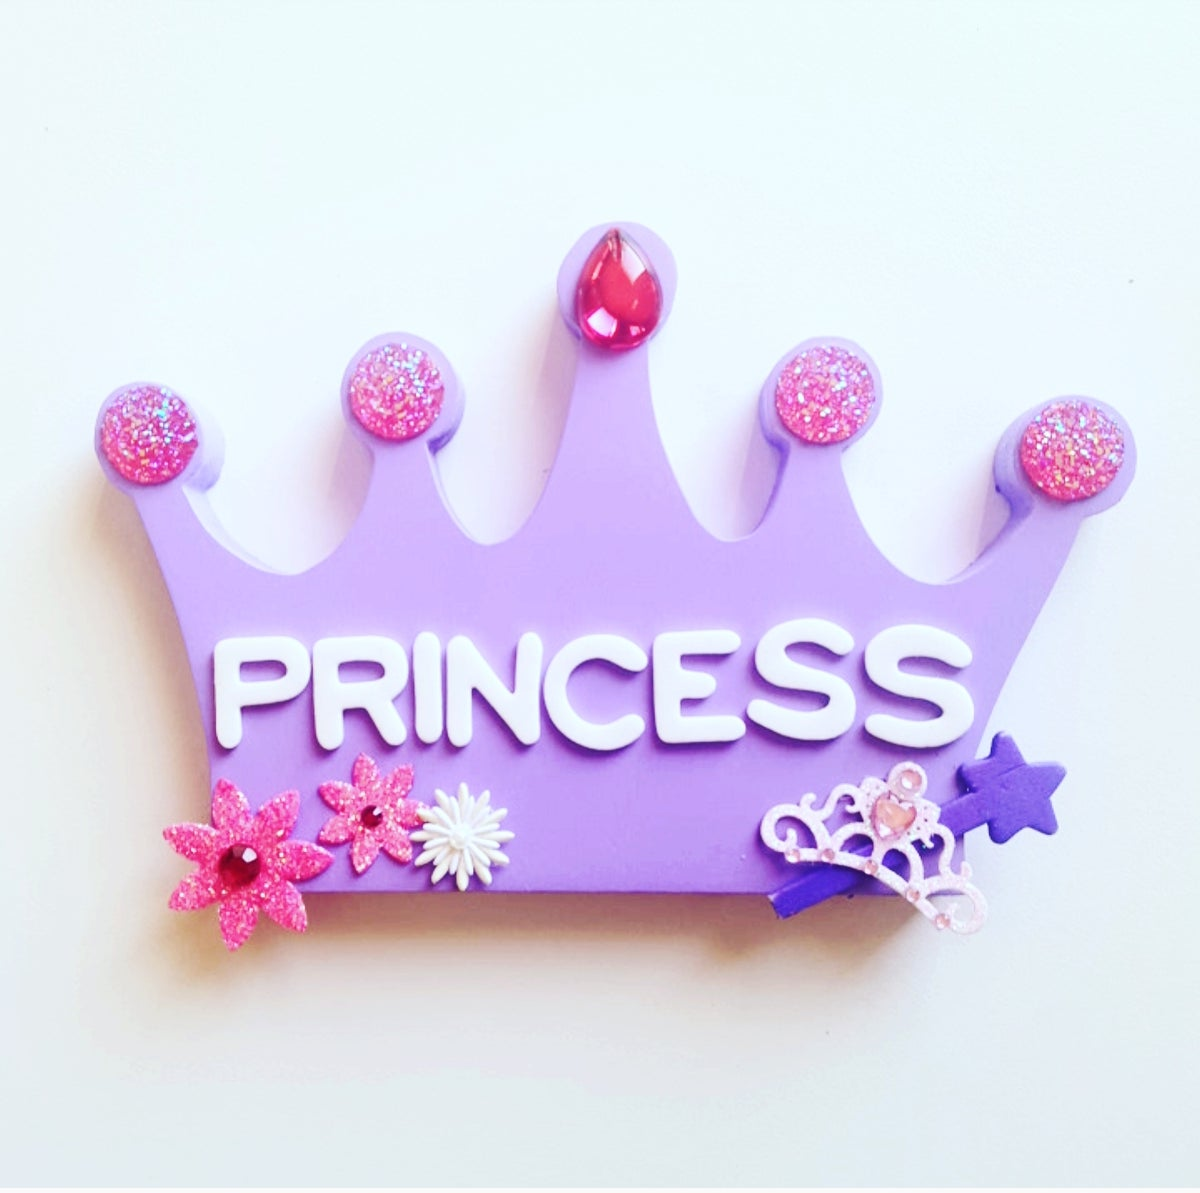 Image of Princess Plaques